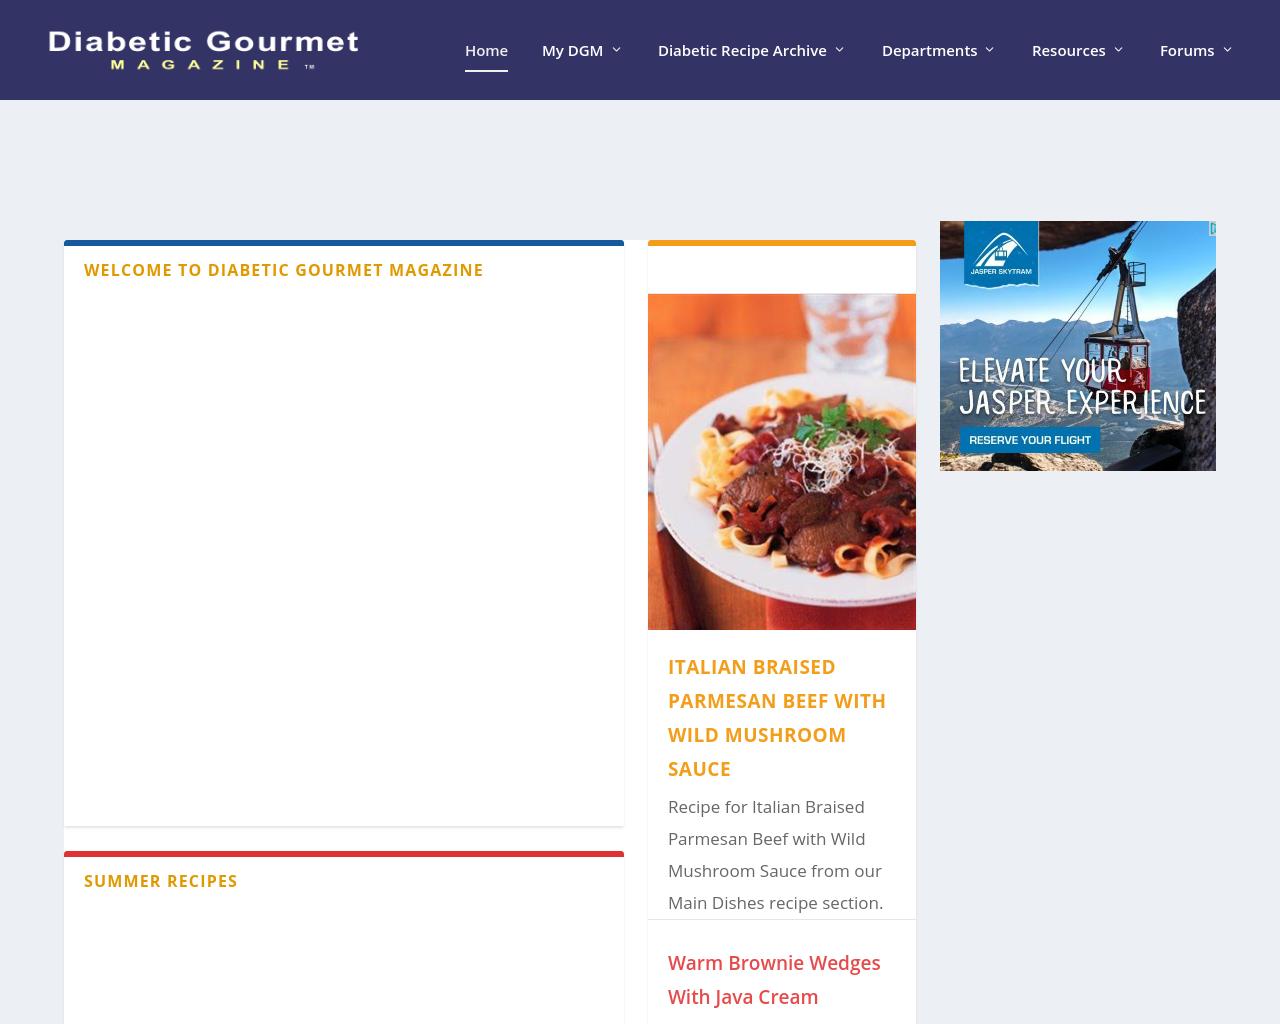 Diabetic-Gourmet-Magazine-Advertising-Reviews-Pricing